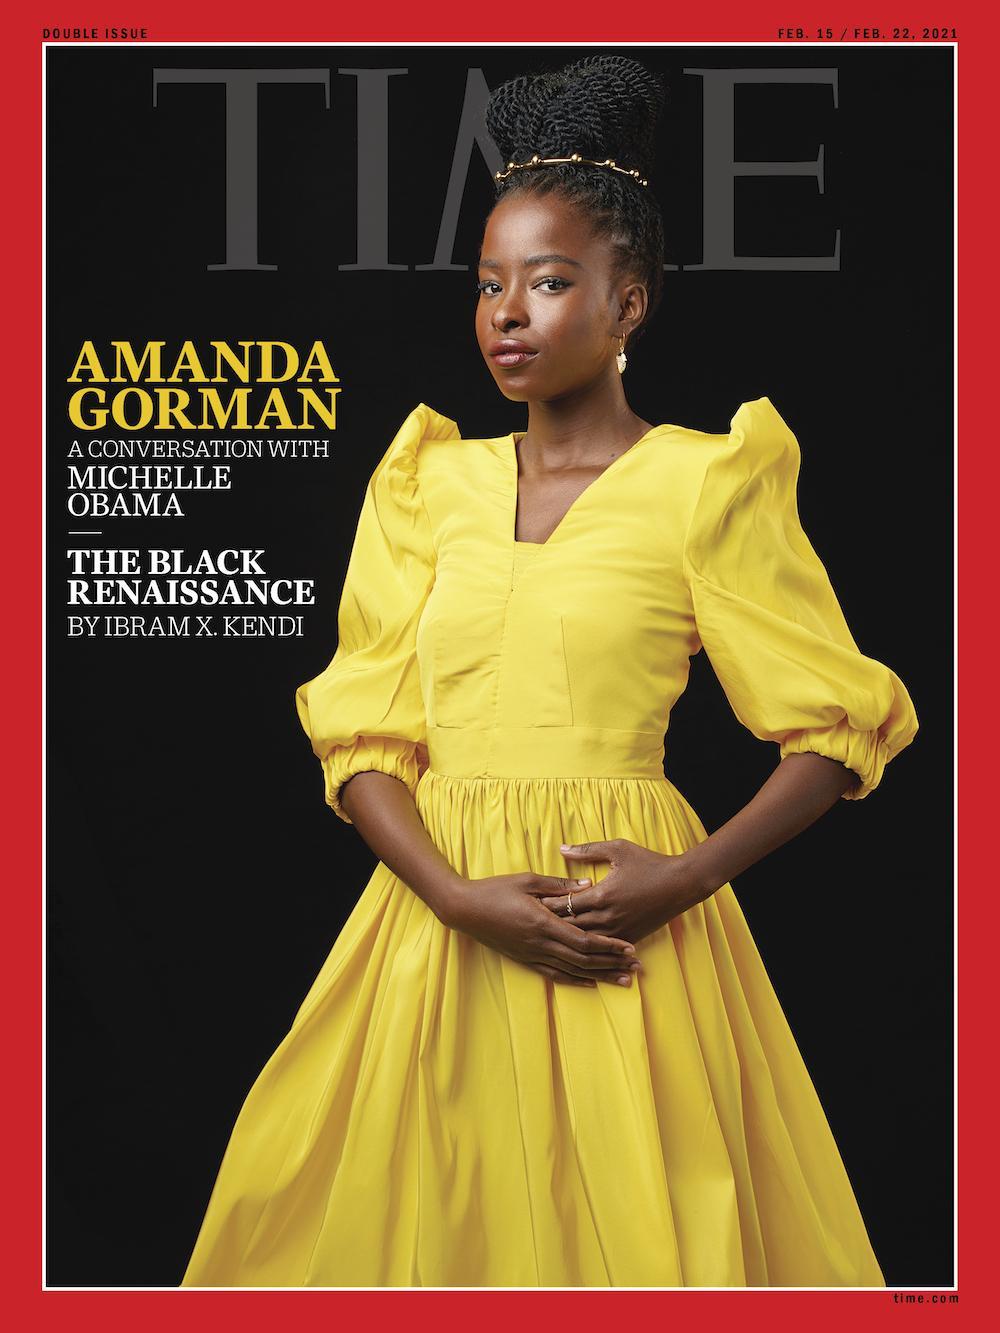 Amanda Gorman on TIME. Photo by Awol Erizku